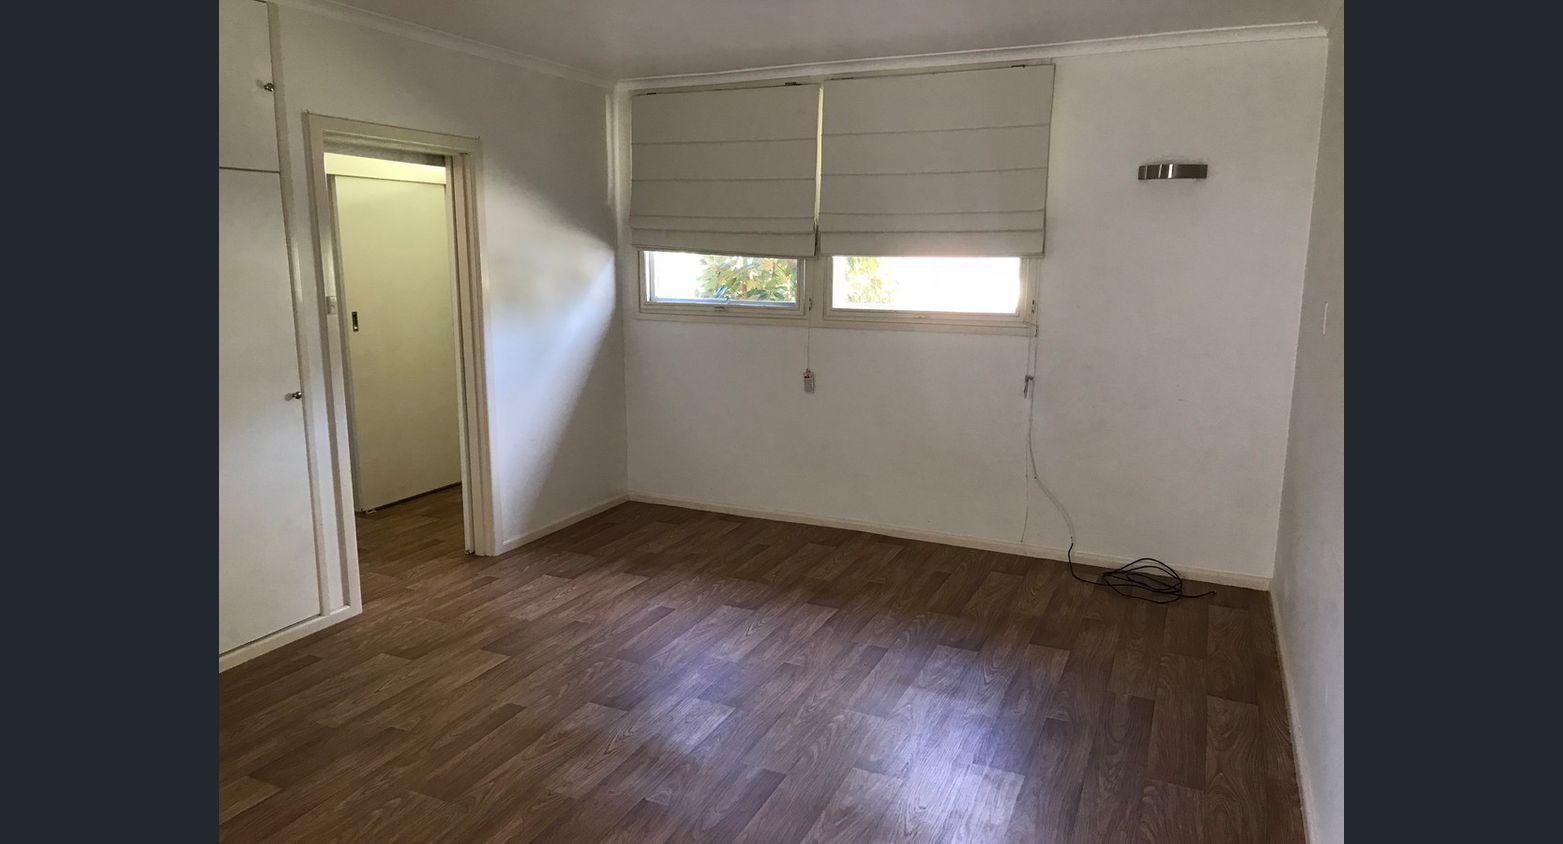 13/24 Mittagang Road, Cooma NSW 2630, Image 1